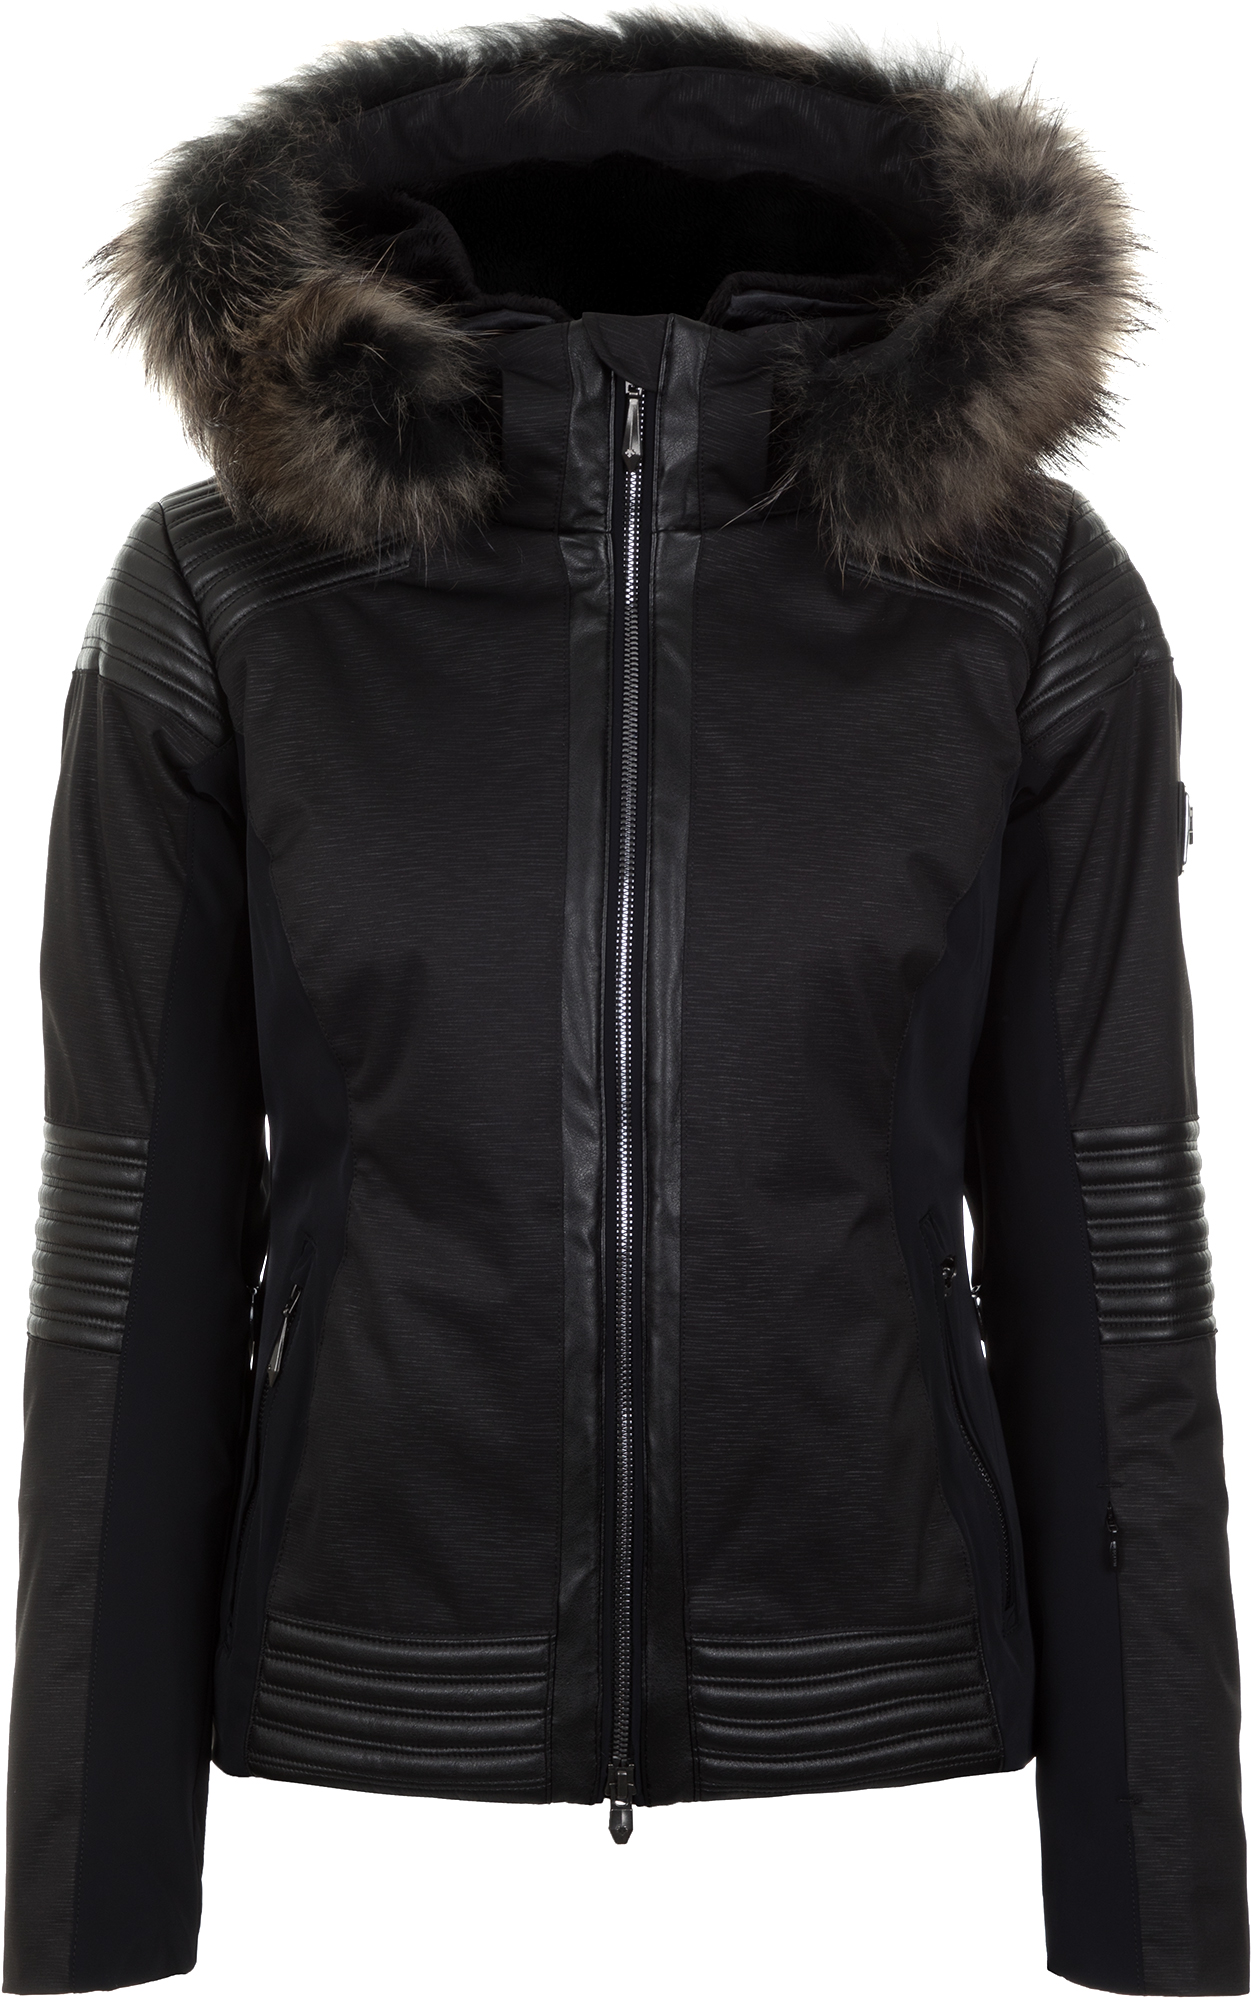 Descente Куртка утепленная женская Descente Cicily, размер 48